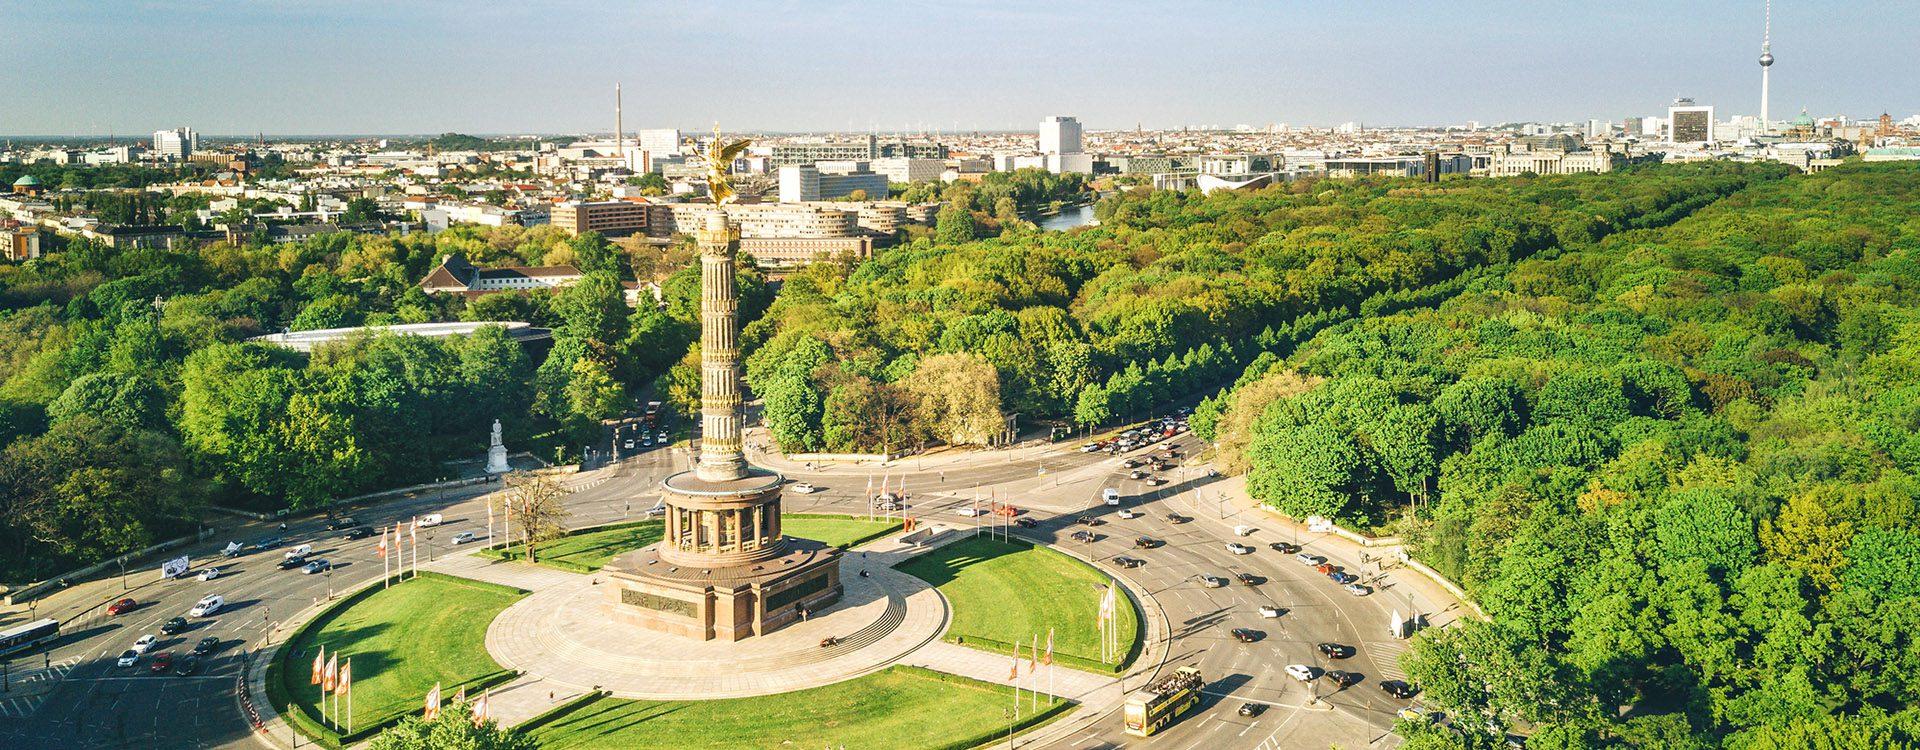 48 horas de escapada en Berlín